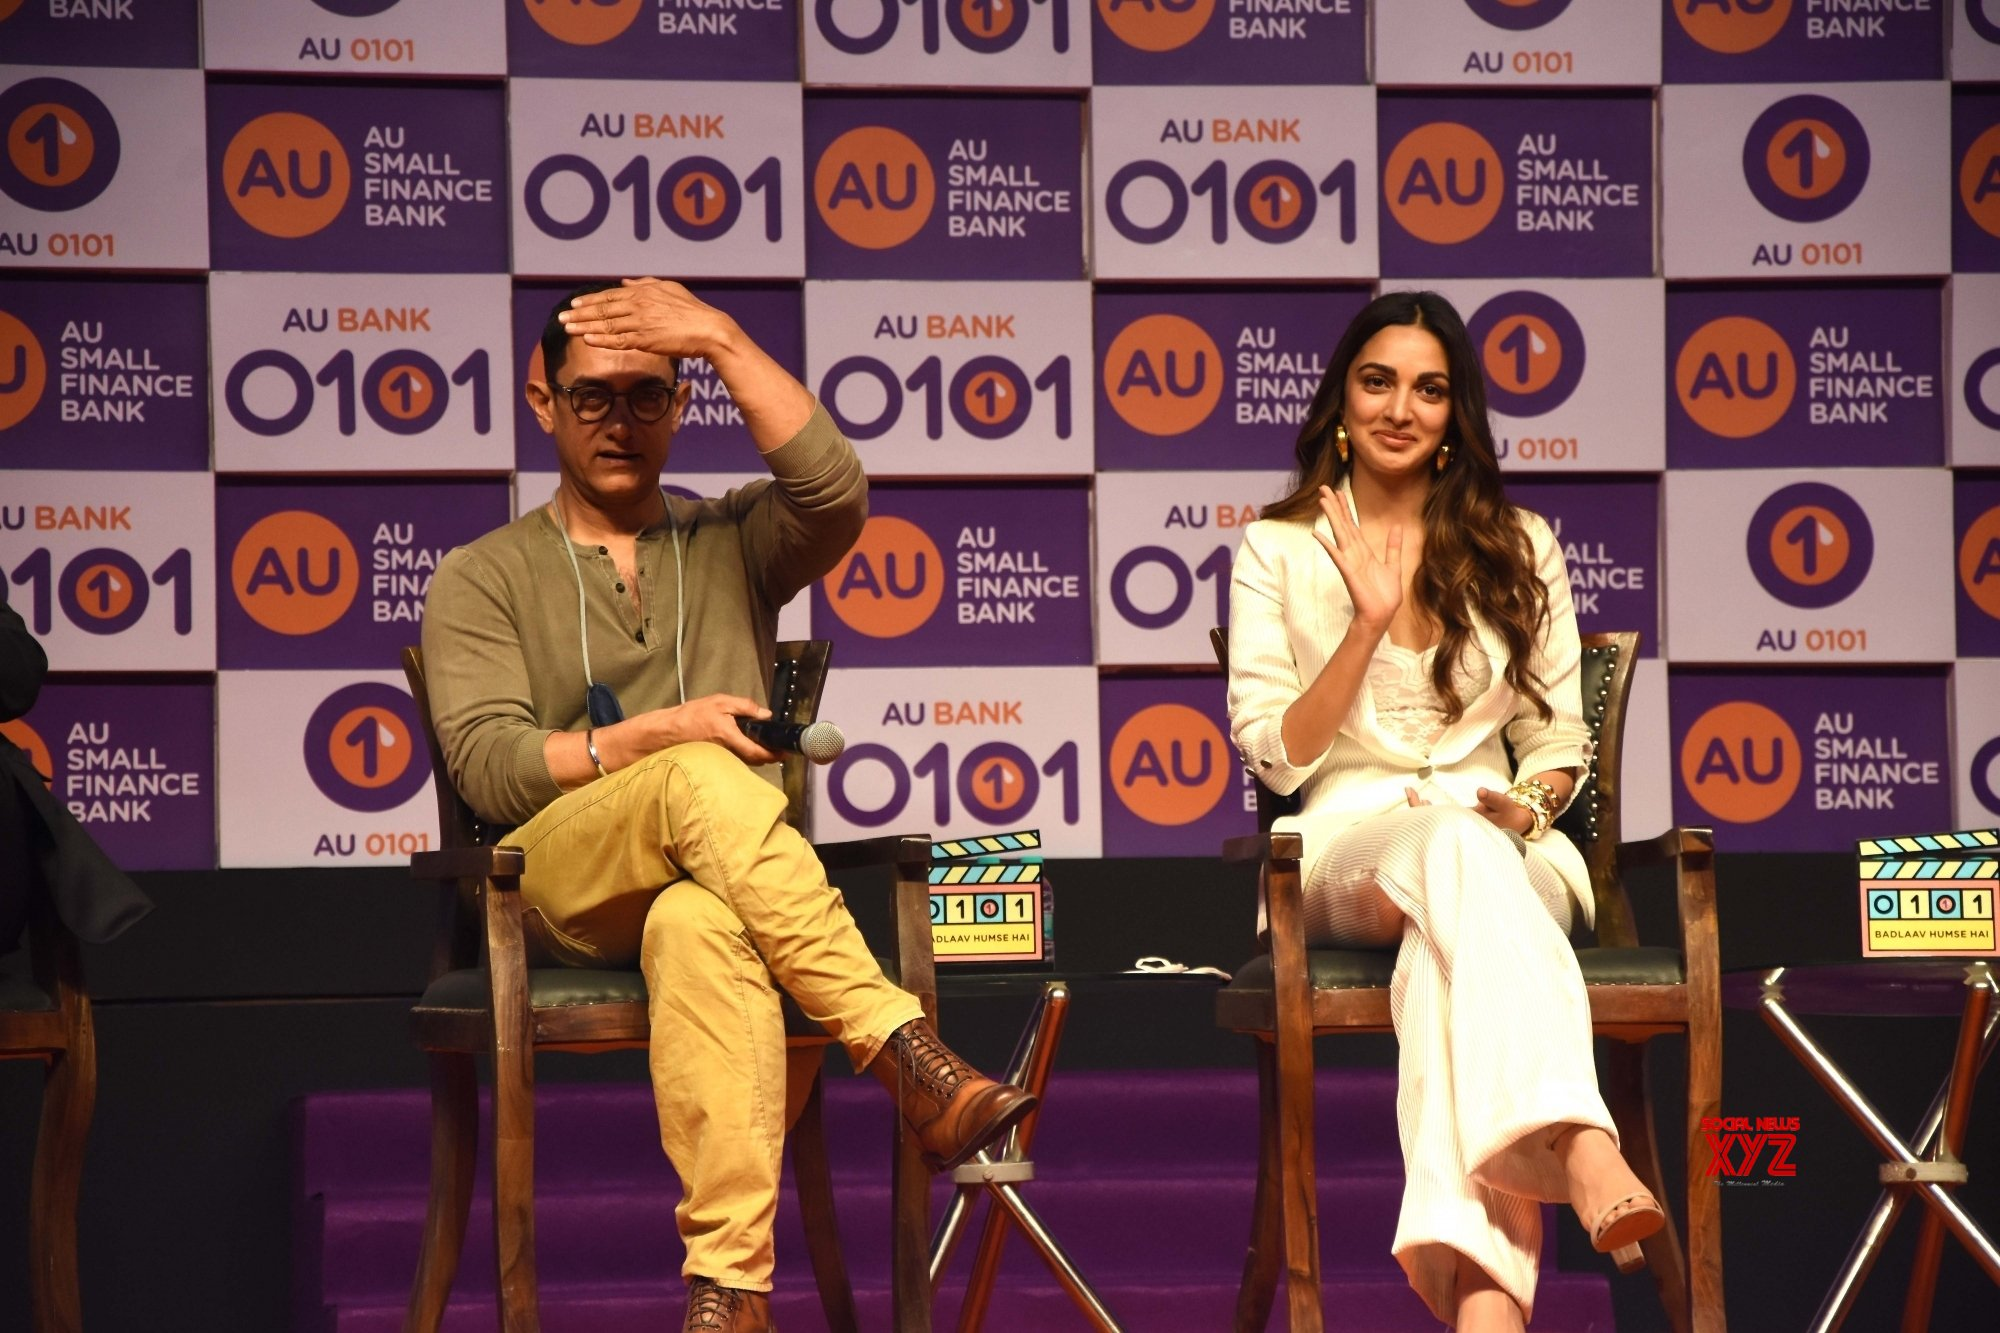 Mumbai: - Aamir Khan and Kiara Advani with Sanjay Agarwal, MD & CEO, AU Small Finance Bank at Santacruz, in Mumbai on Wednesday August 11, 2021 #Gallery